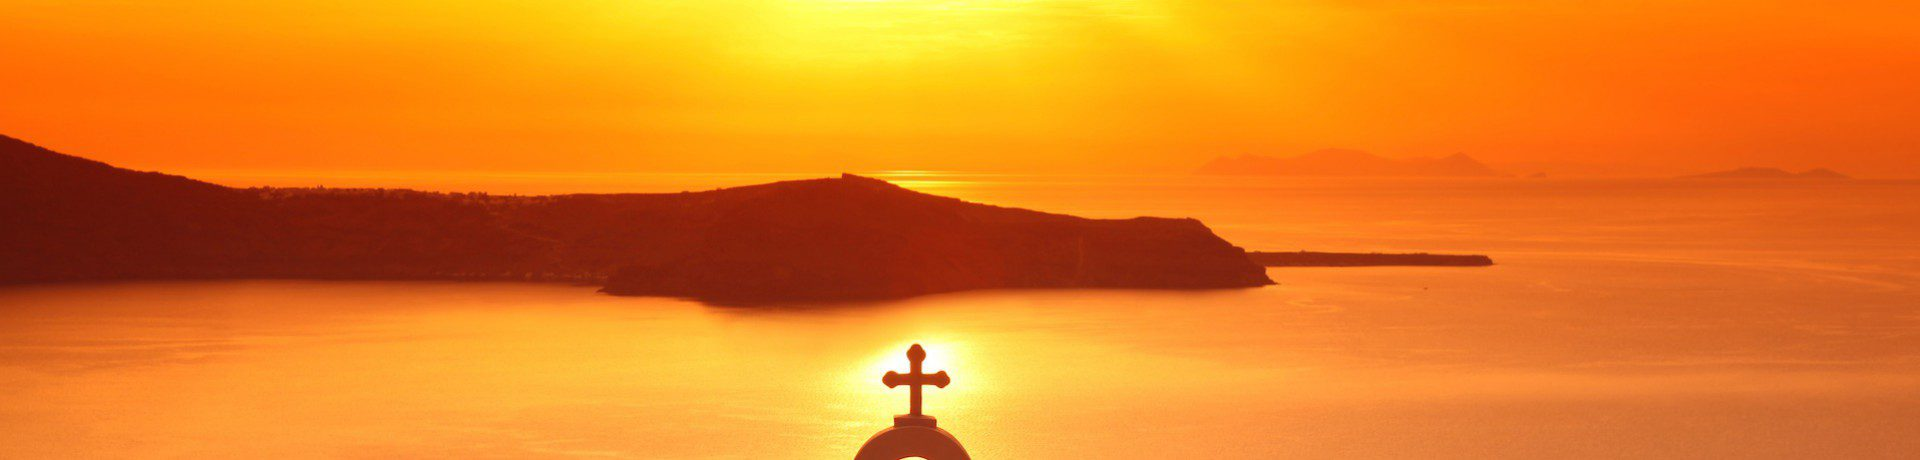 Supertrips - Santorini